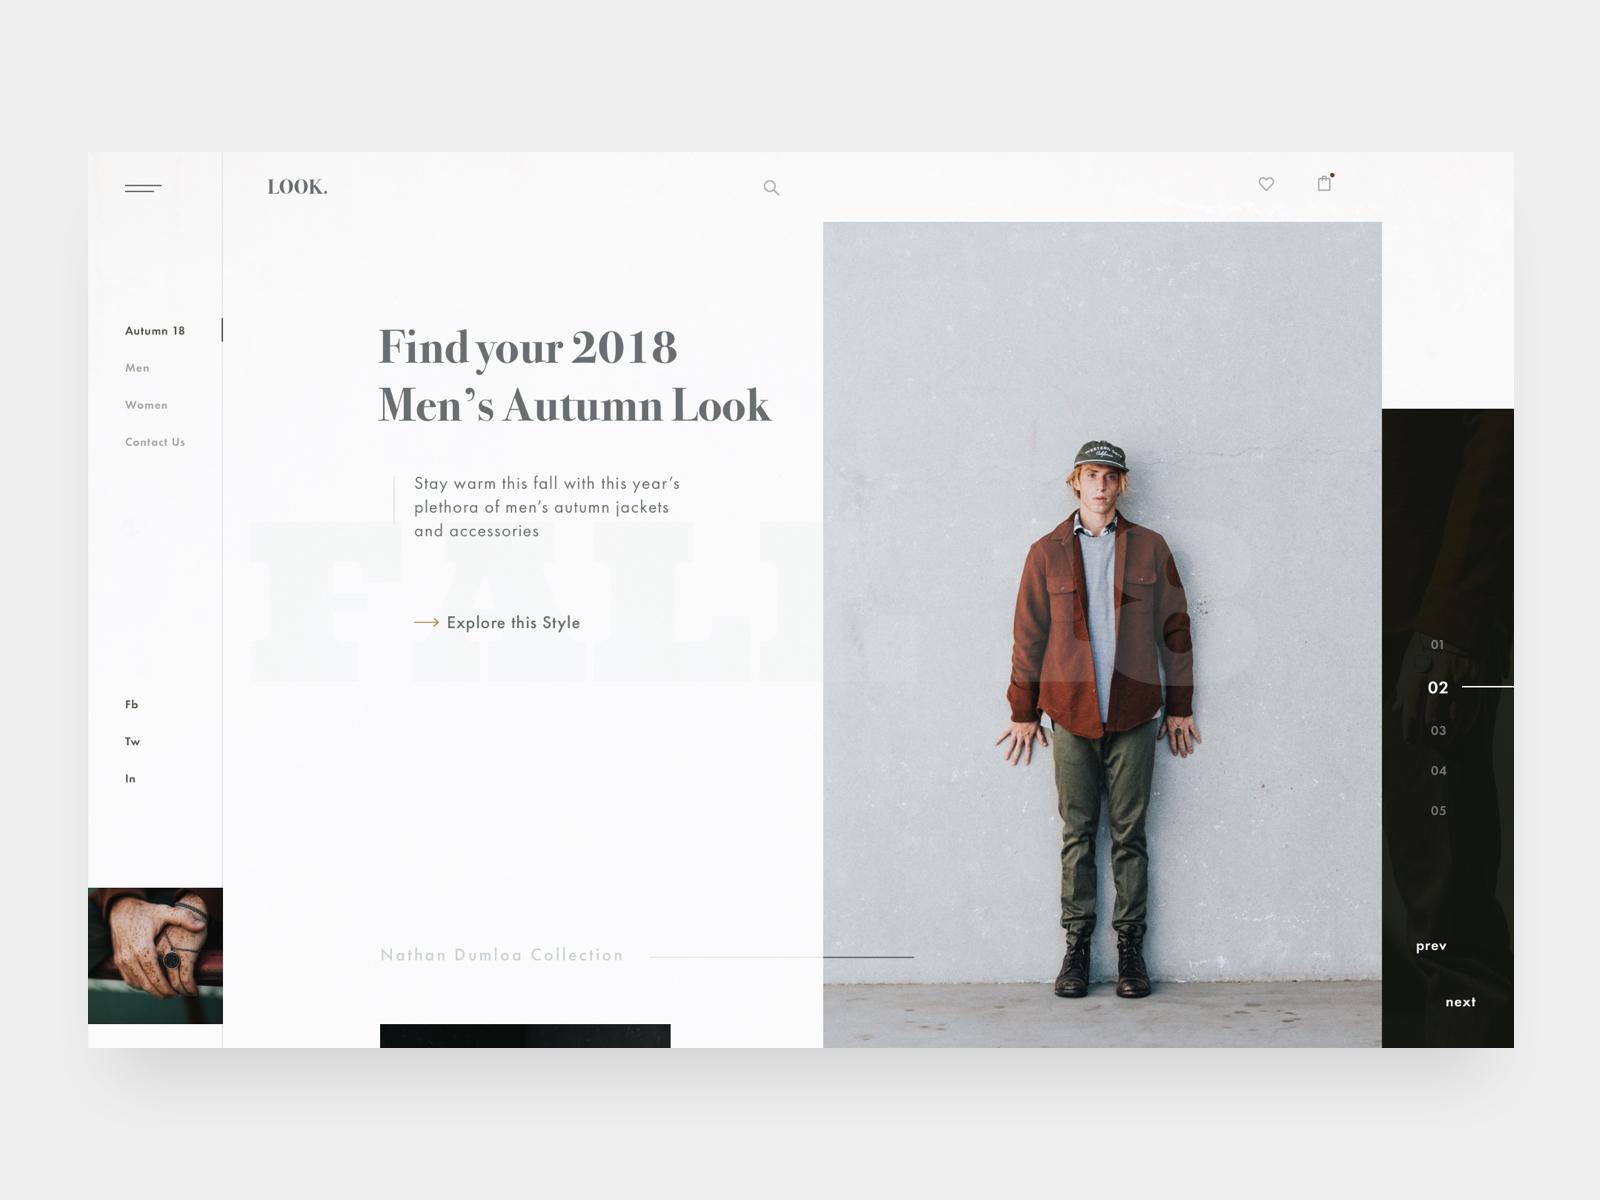 Lookbook layout expoloration i